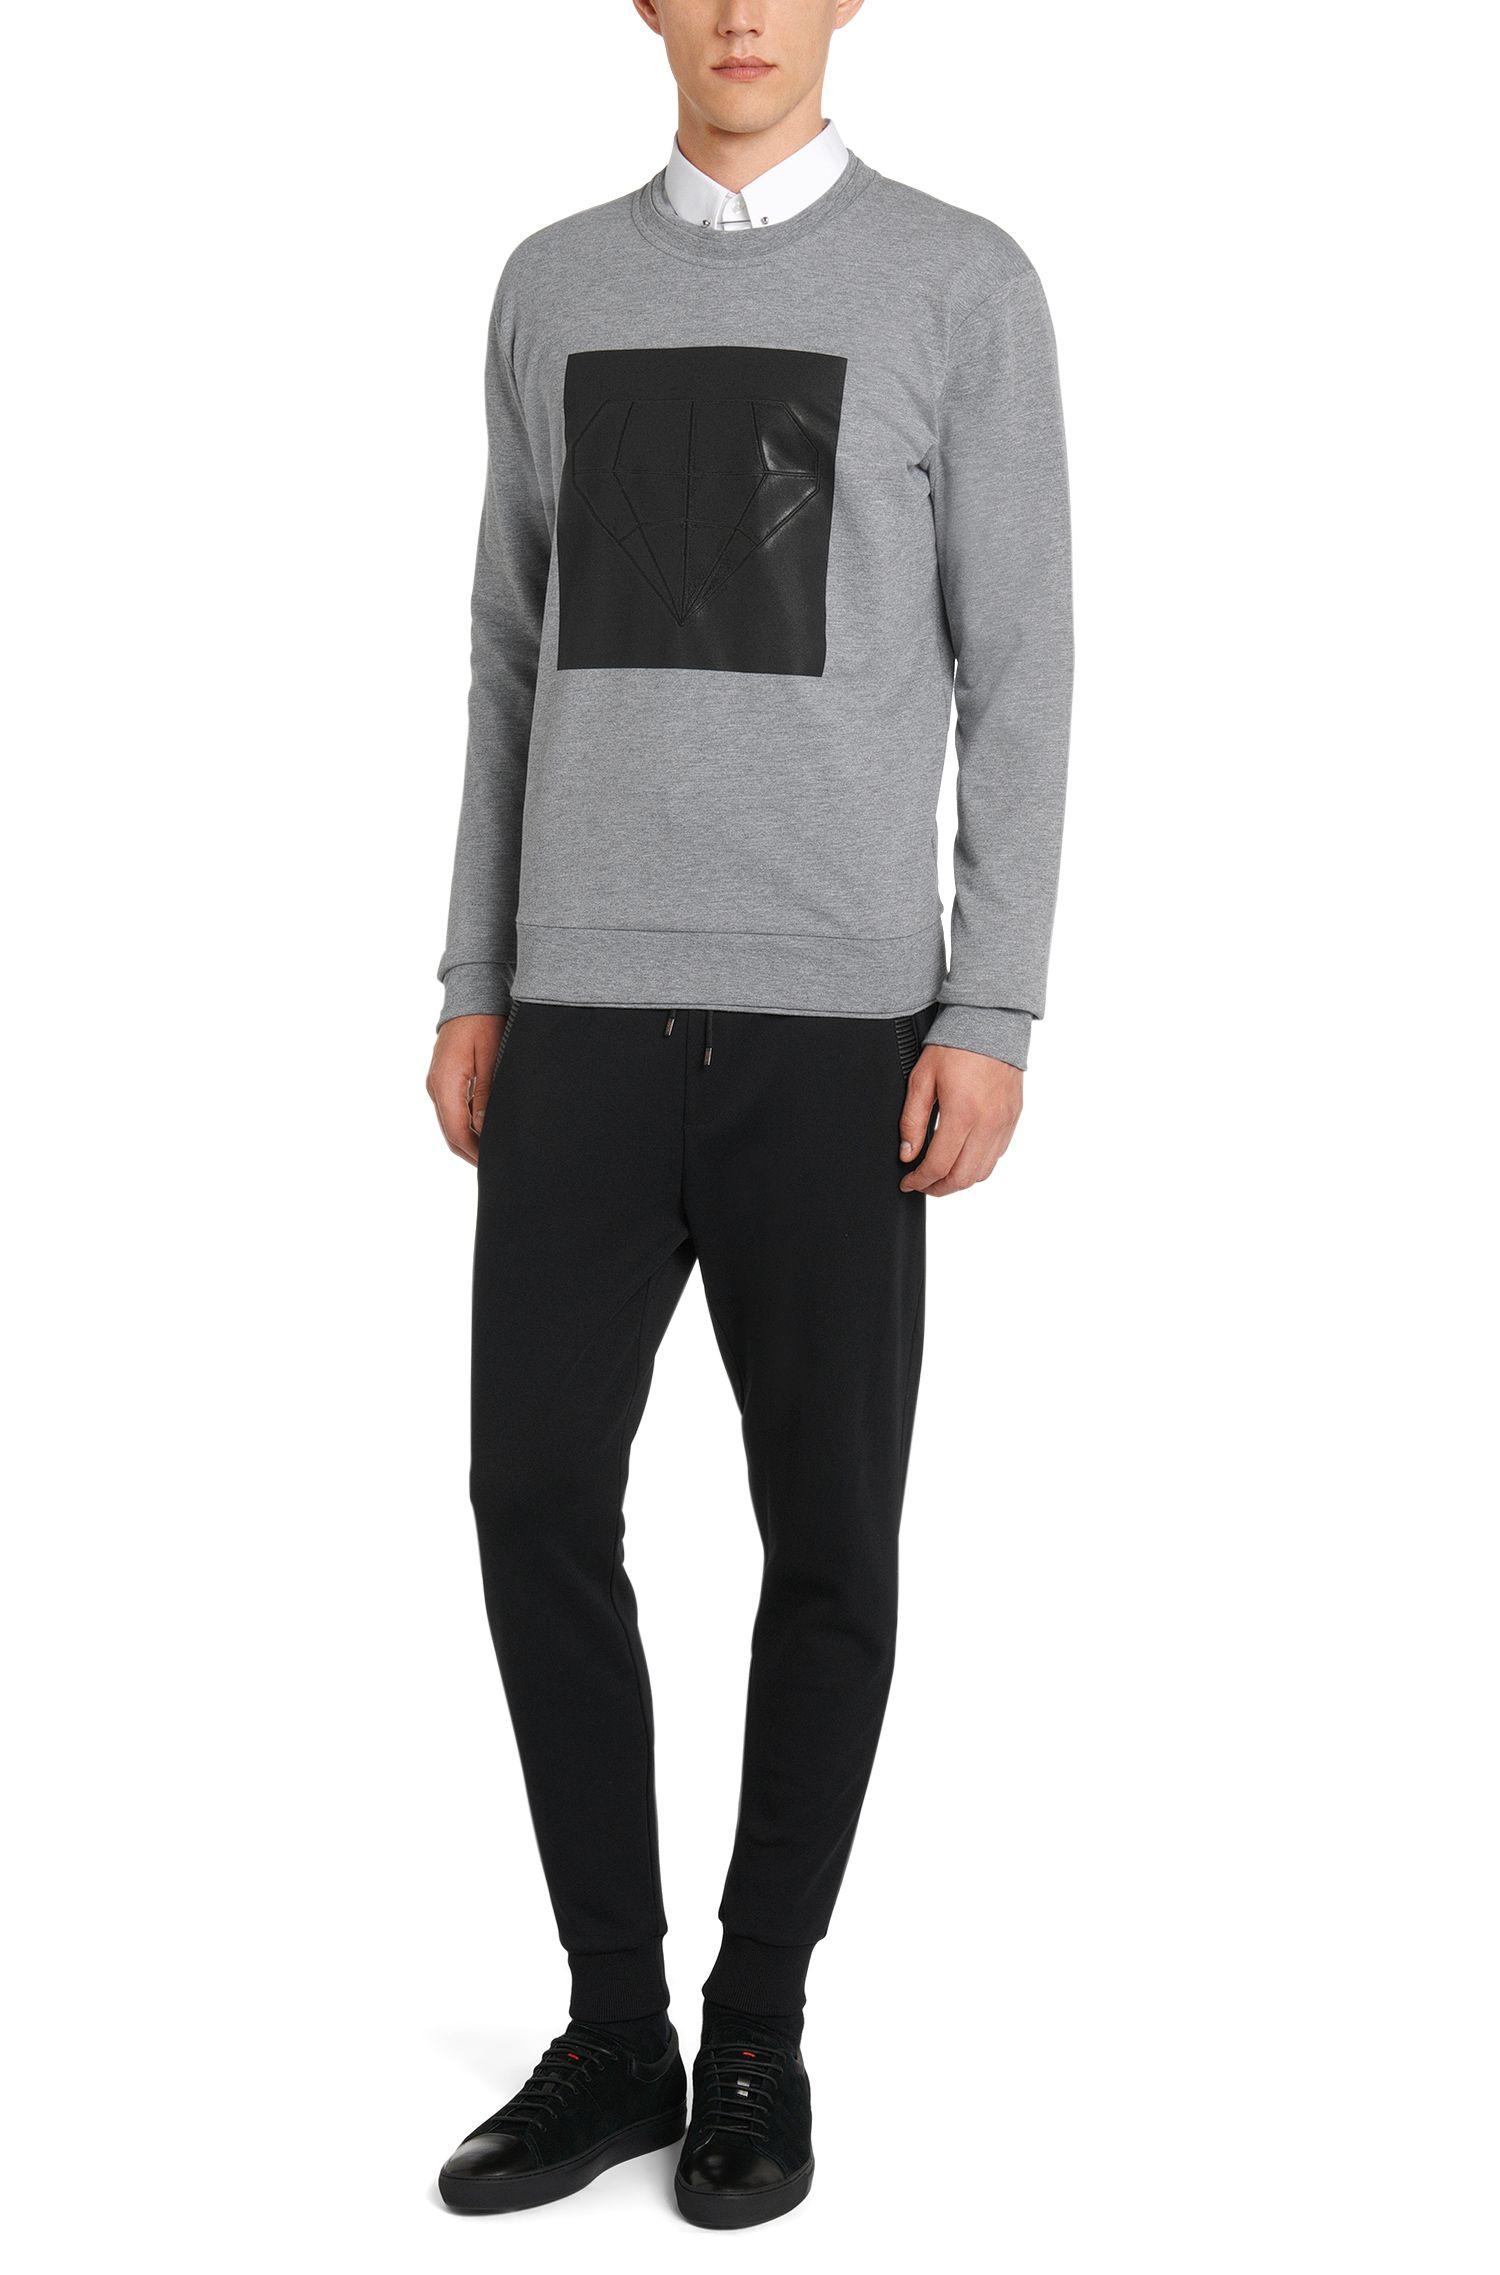 Regular-Fit Sweathose aus Baumwolle mit Details in Leder-Optik: 'Drontier'